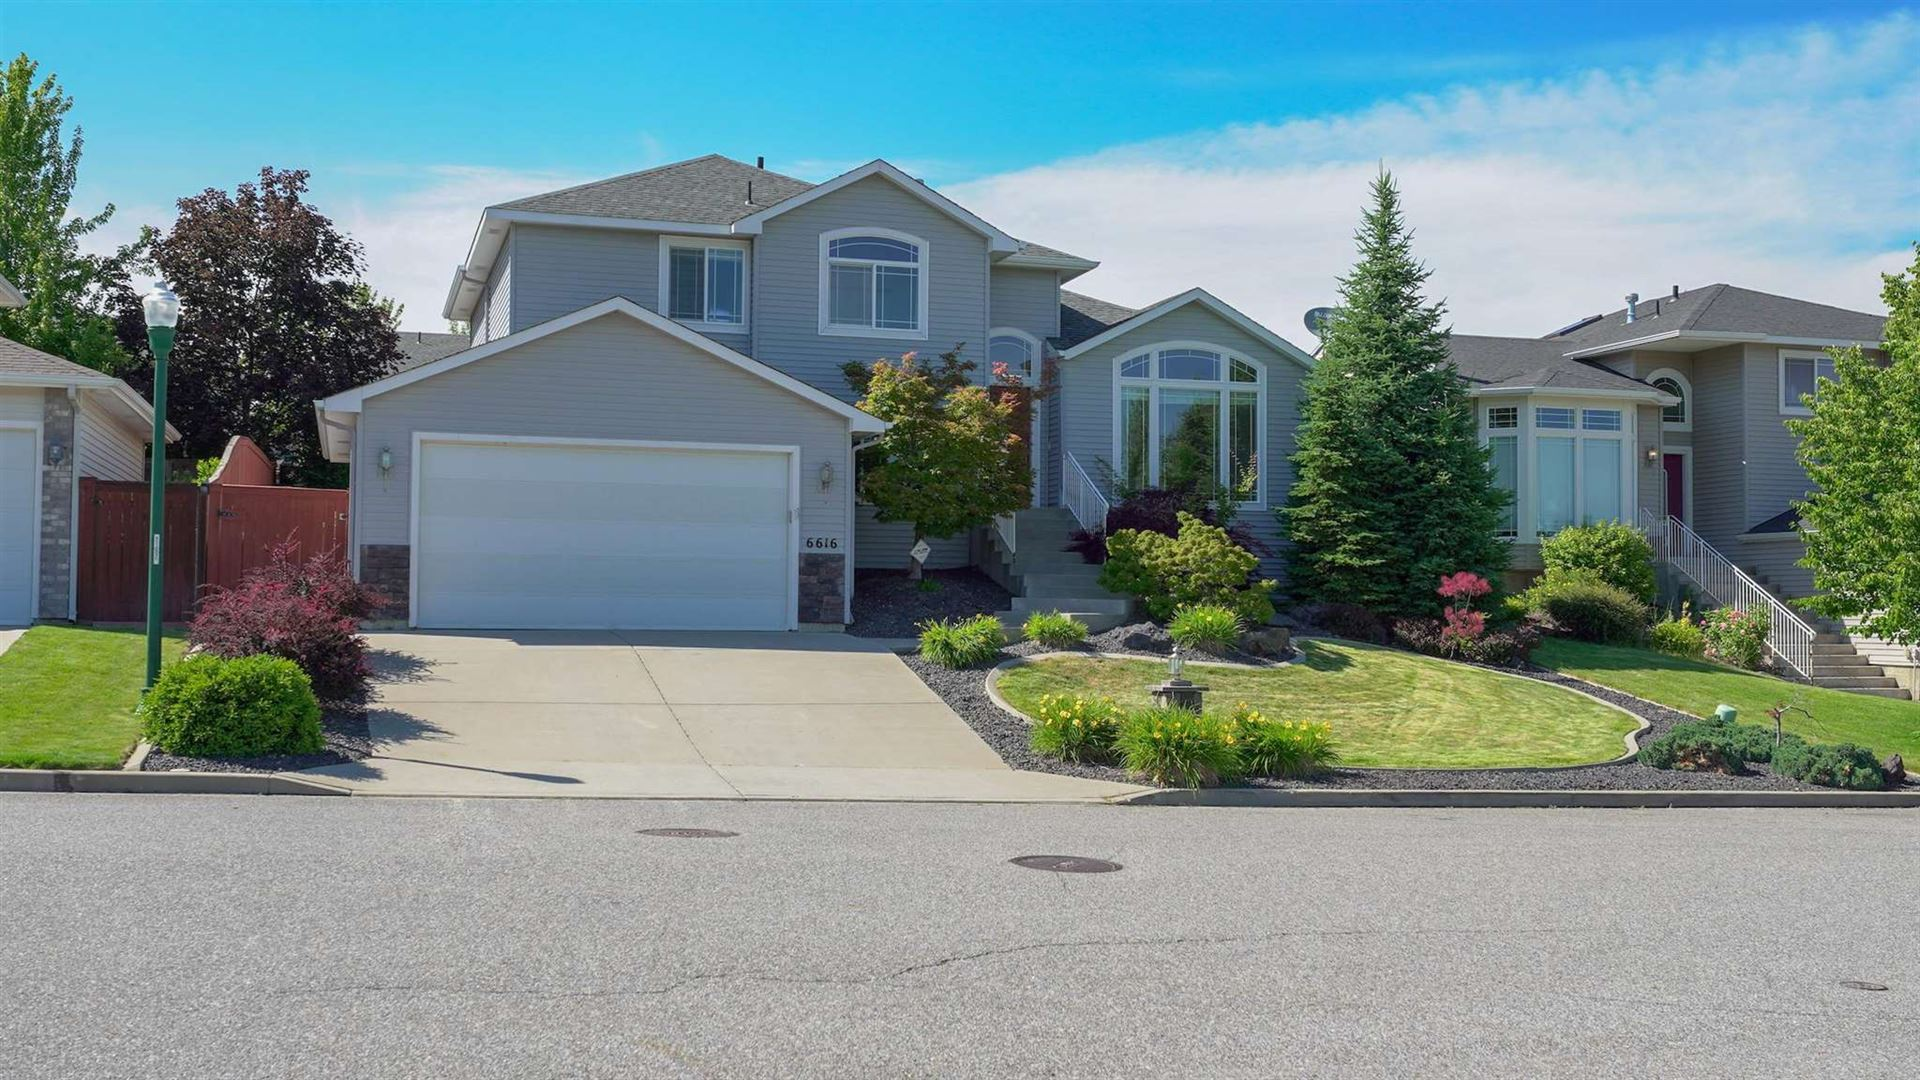 6616 S Baymont St, Spokane, WA 99224 - #: 202117556